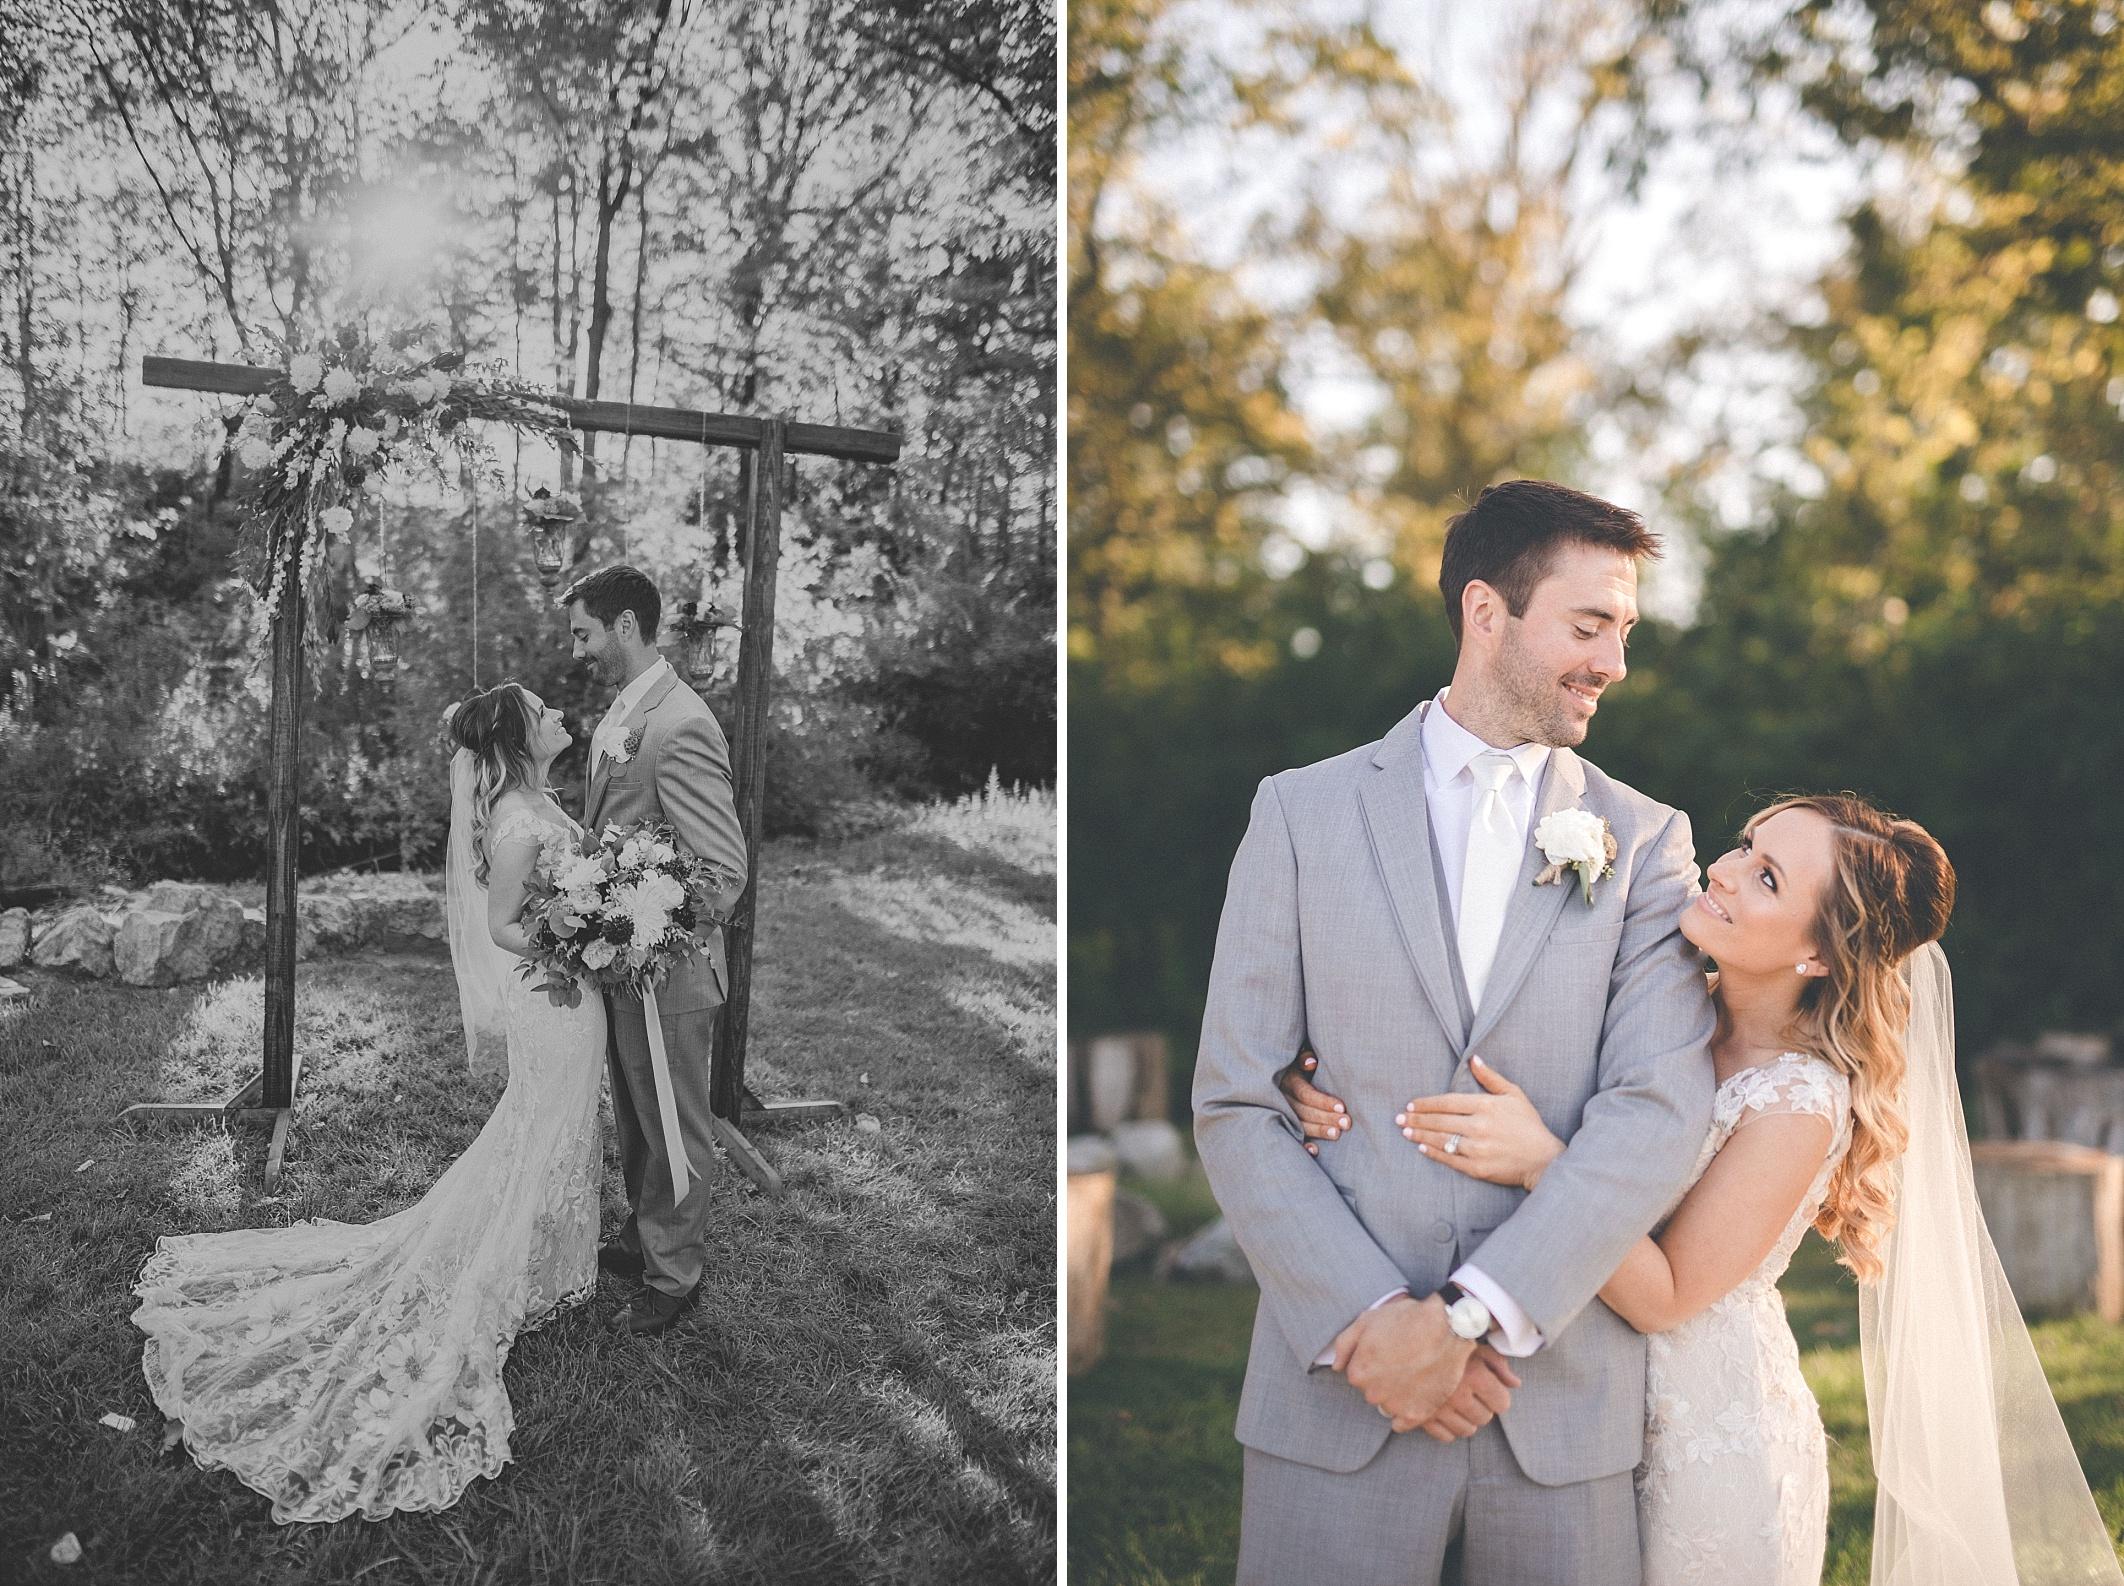 wedding-photographer-dayton-ohio_0205.jpg